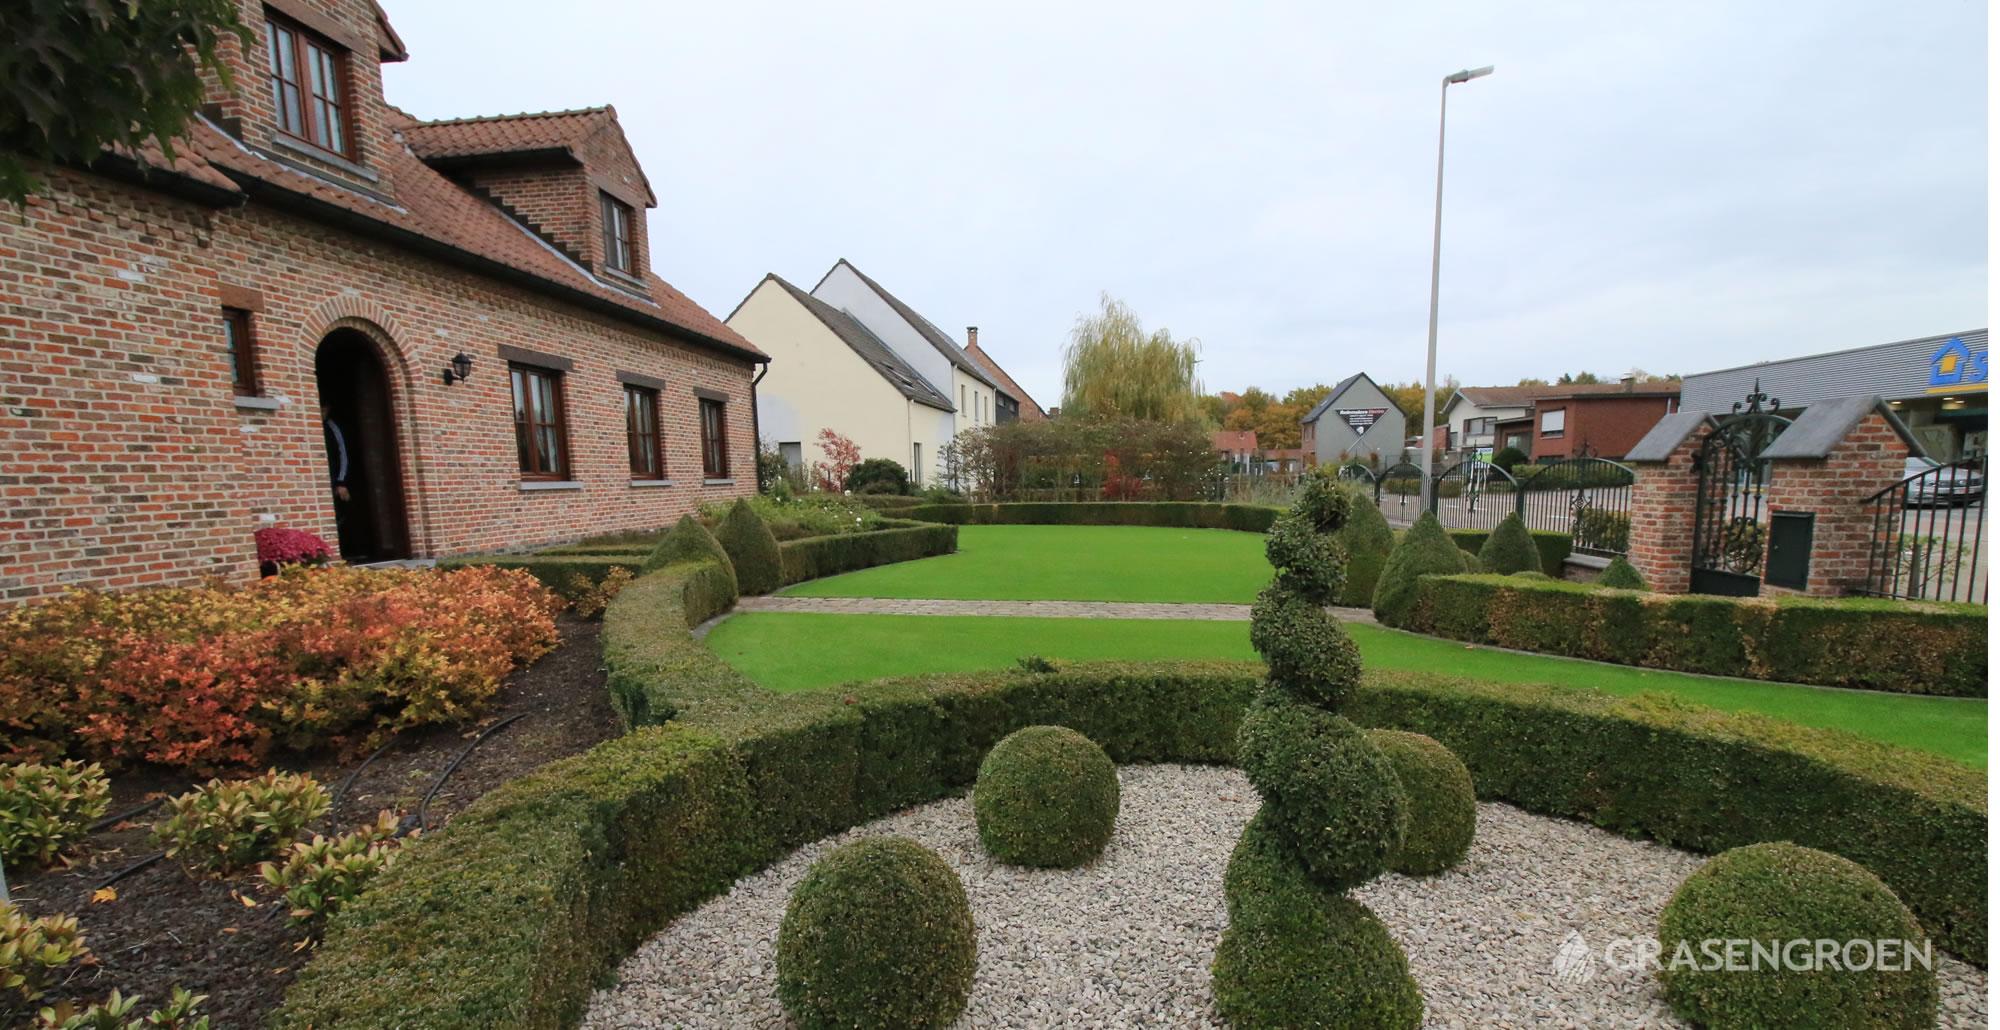 Kunstgrasleggenkermt15 • Gras en Groen Kunstgras